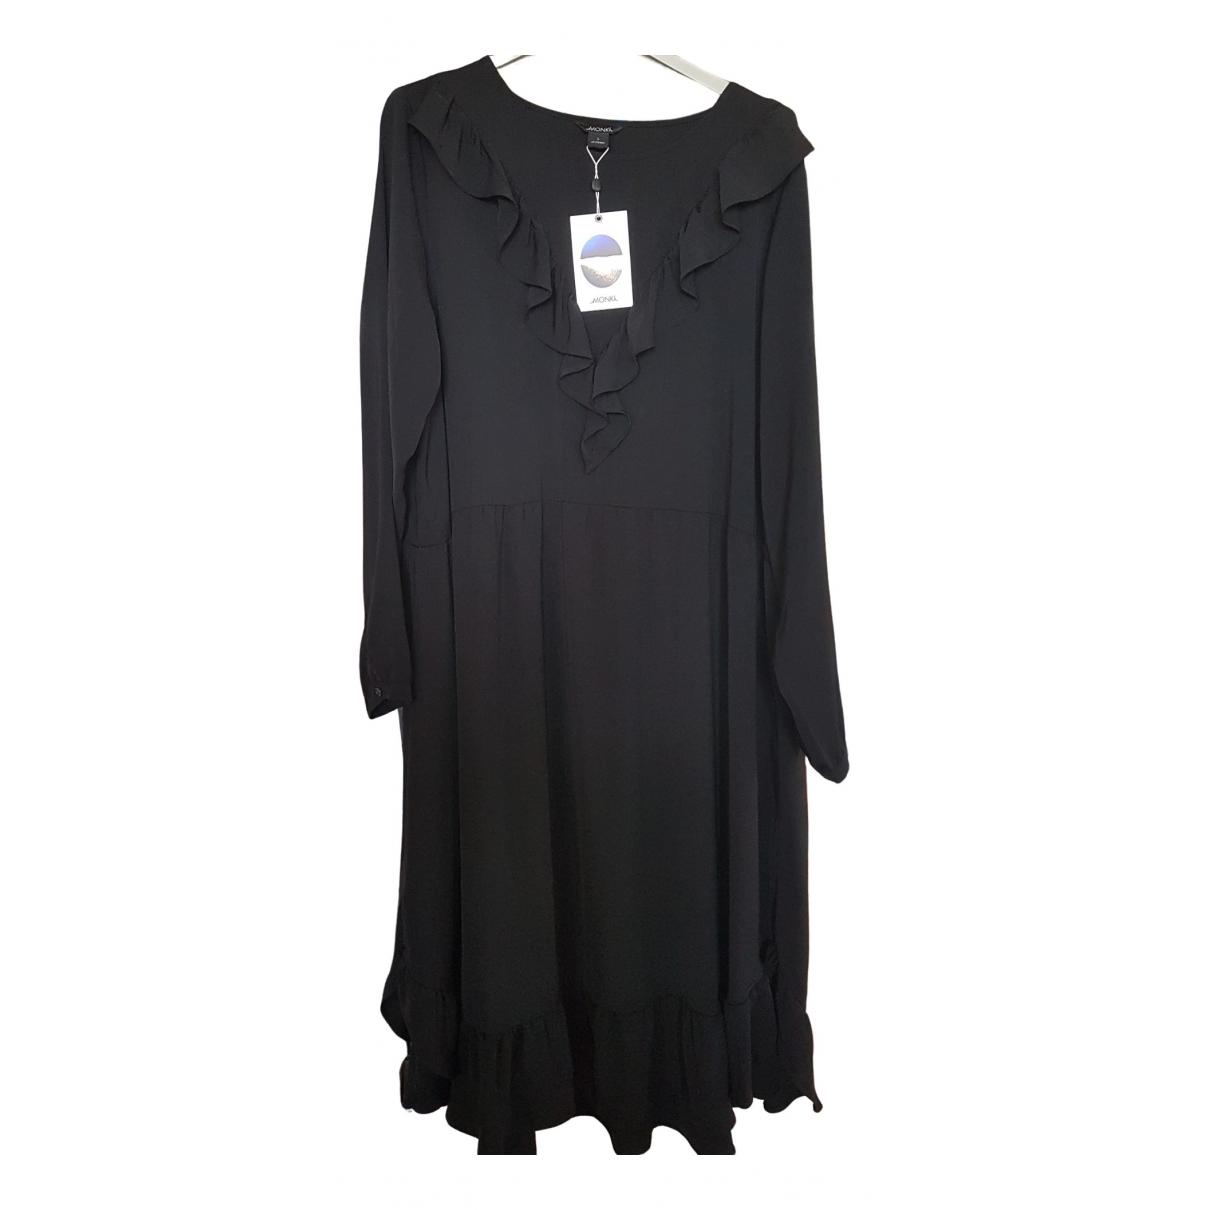 Monki \N Kleid in  Schwarz Viskose